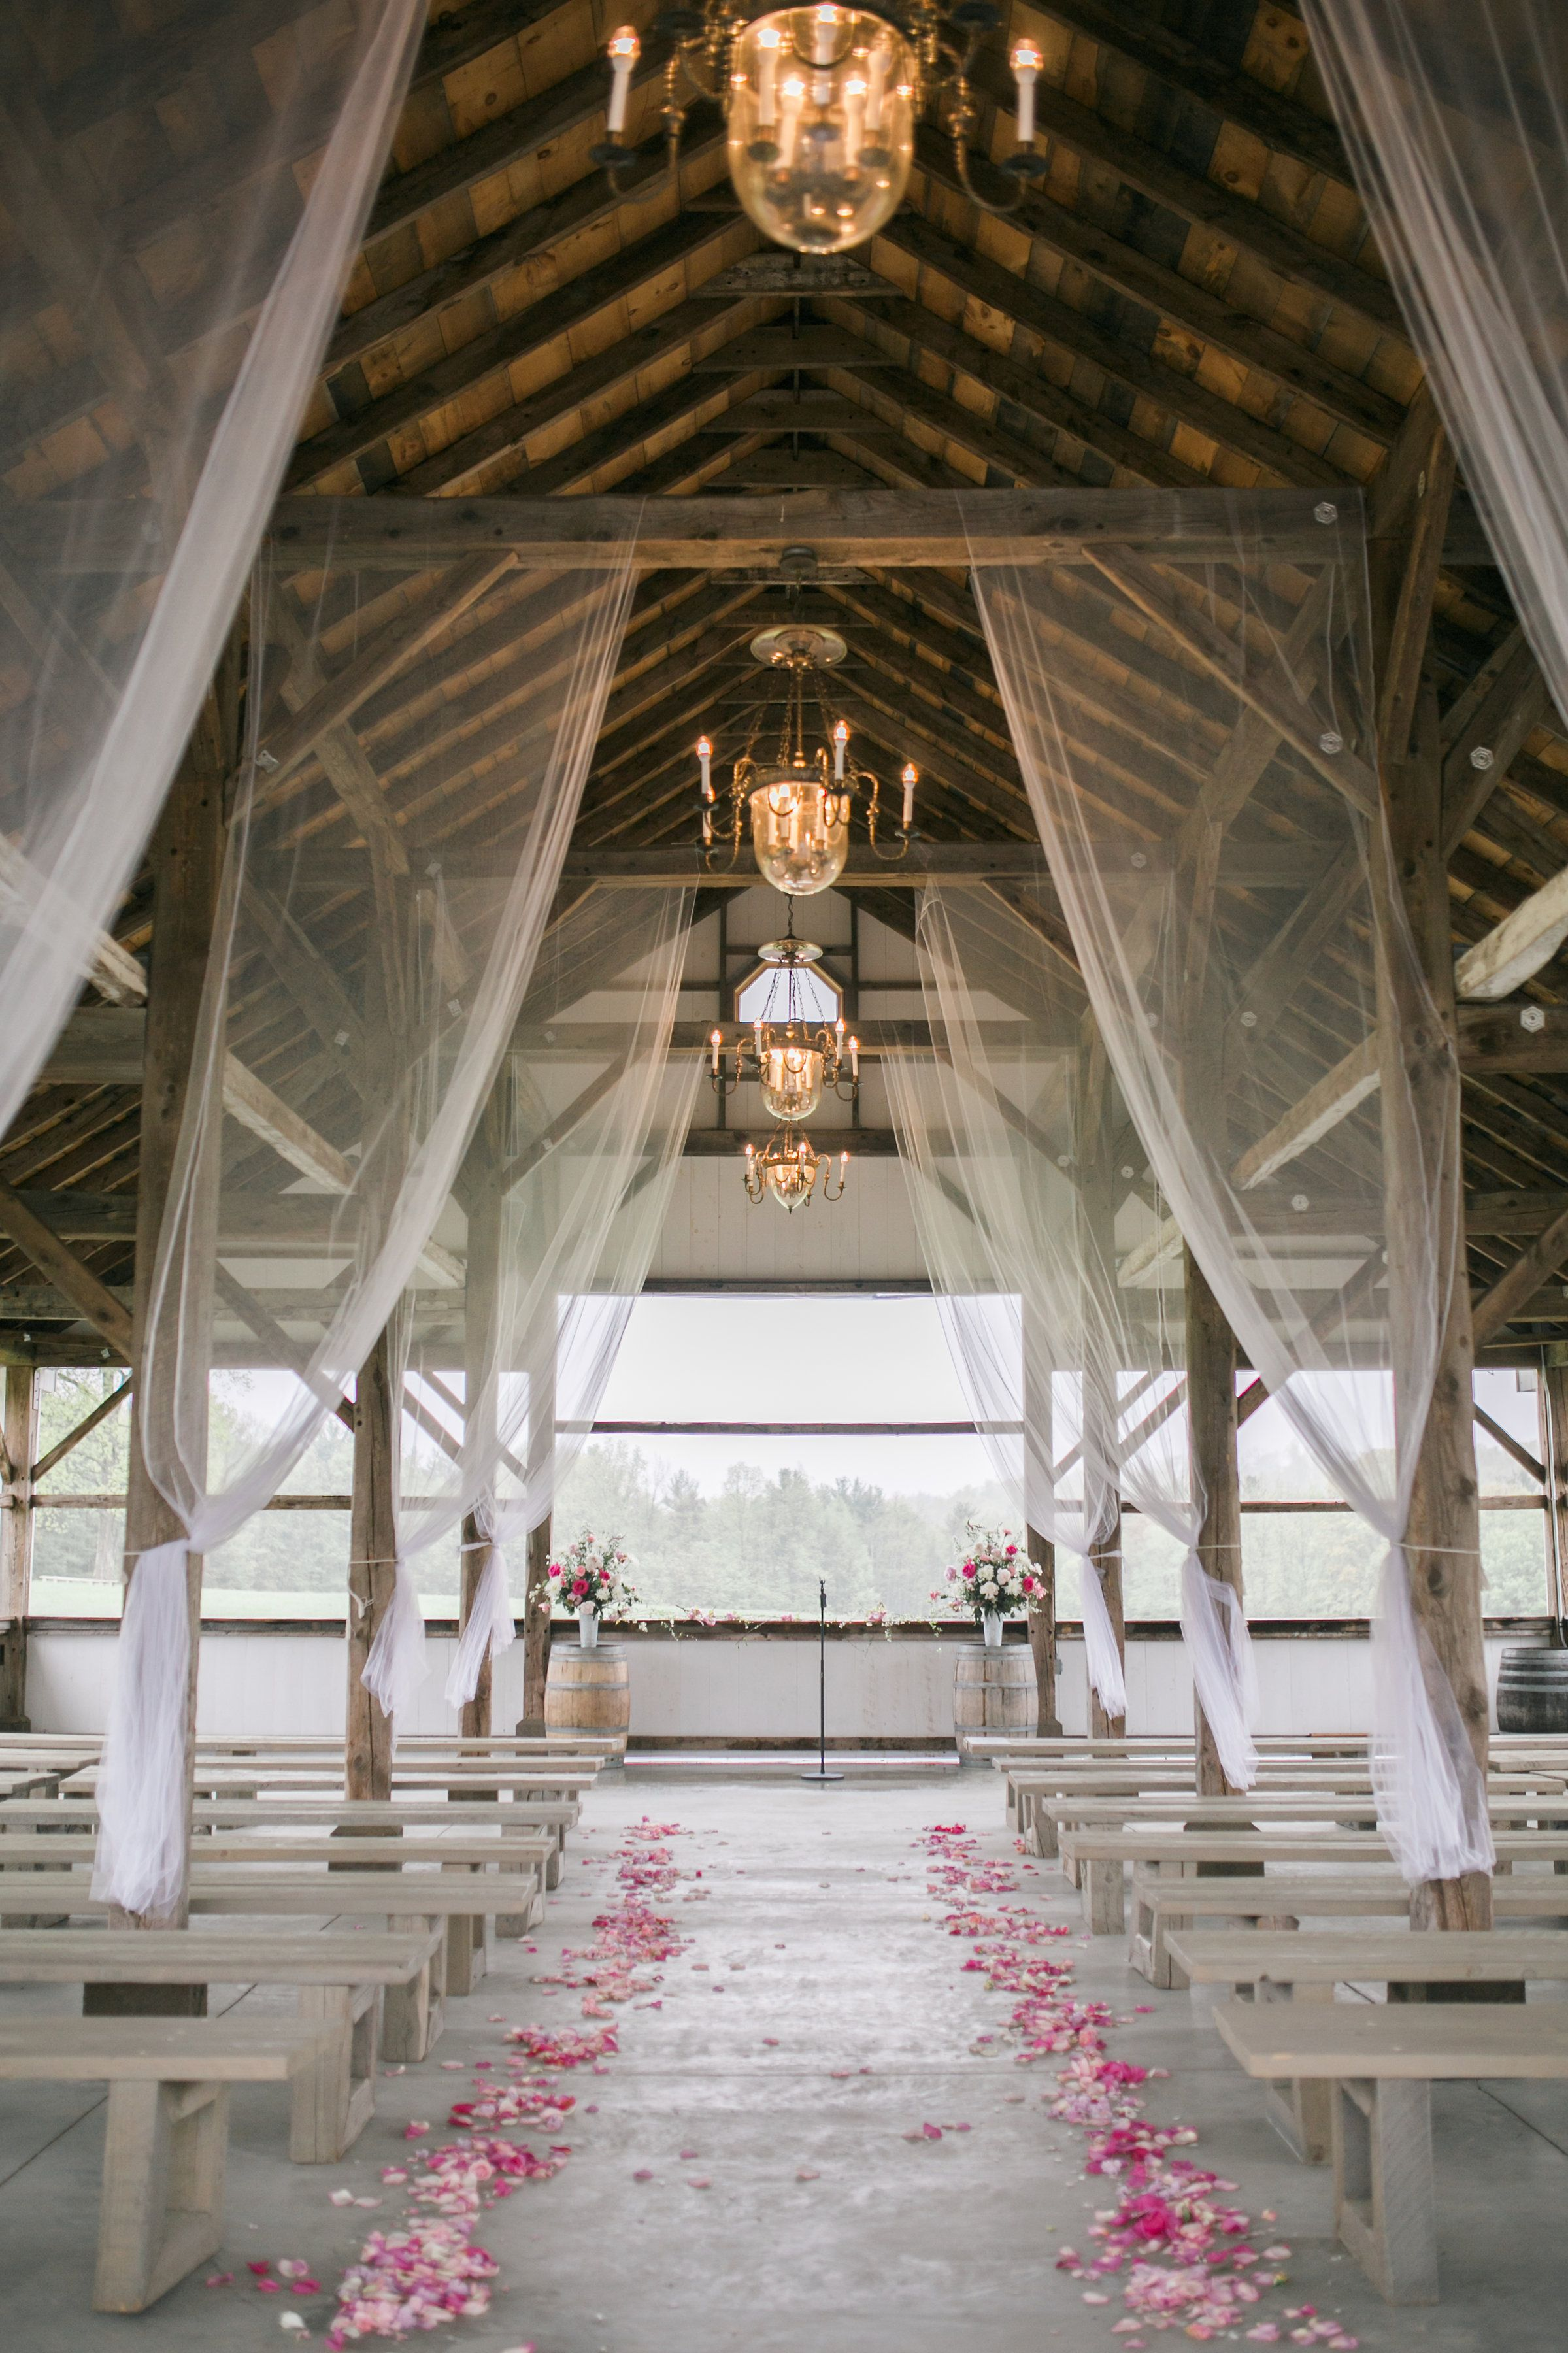 Ma Weddings Outdoor Wedding Venues Spencer Ma Worcester Area Wedding Locations Zukas Hillt Massachusetts Wedding Venues Outdoor Wedding Venues Tent Wedding